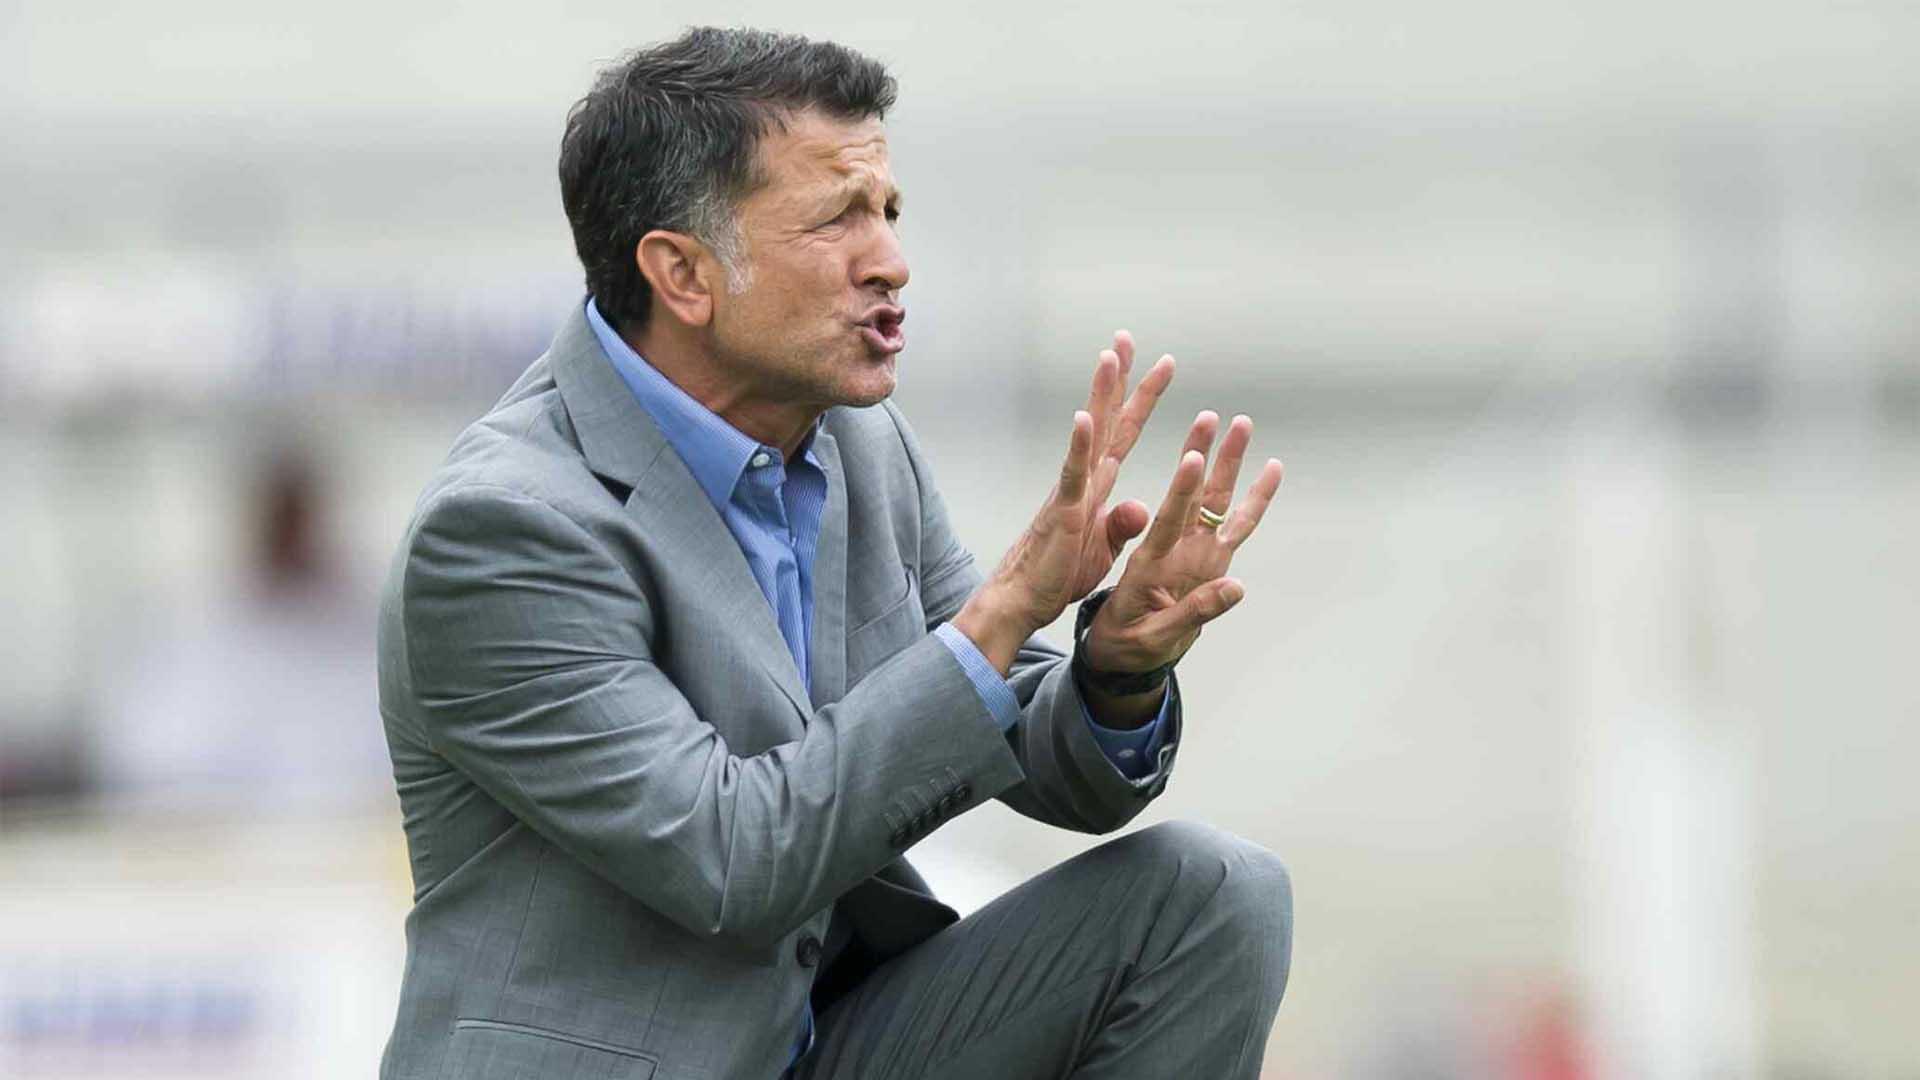 5 Facts You Might Not Know About El Tri Coach Juan Carlos Osorio